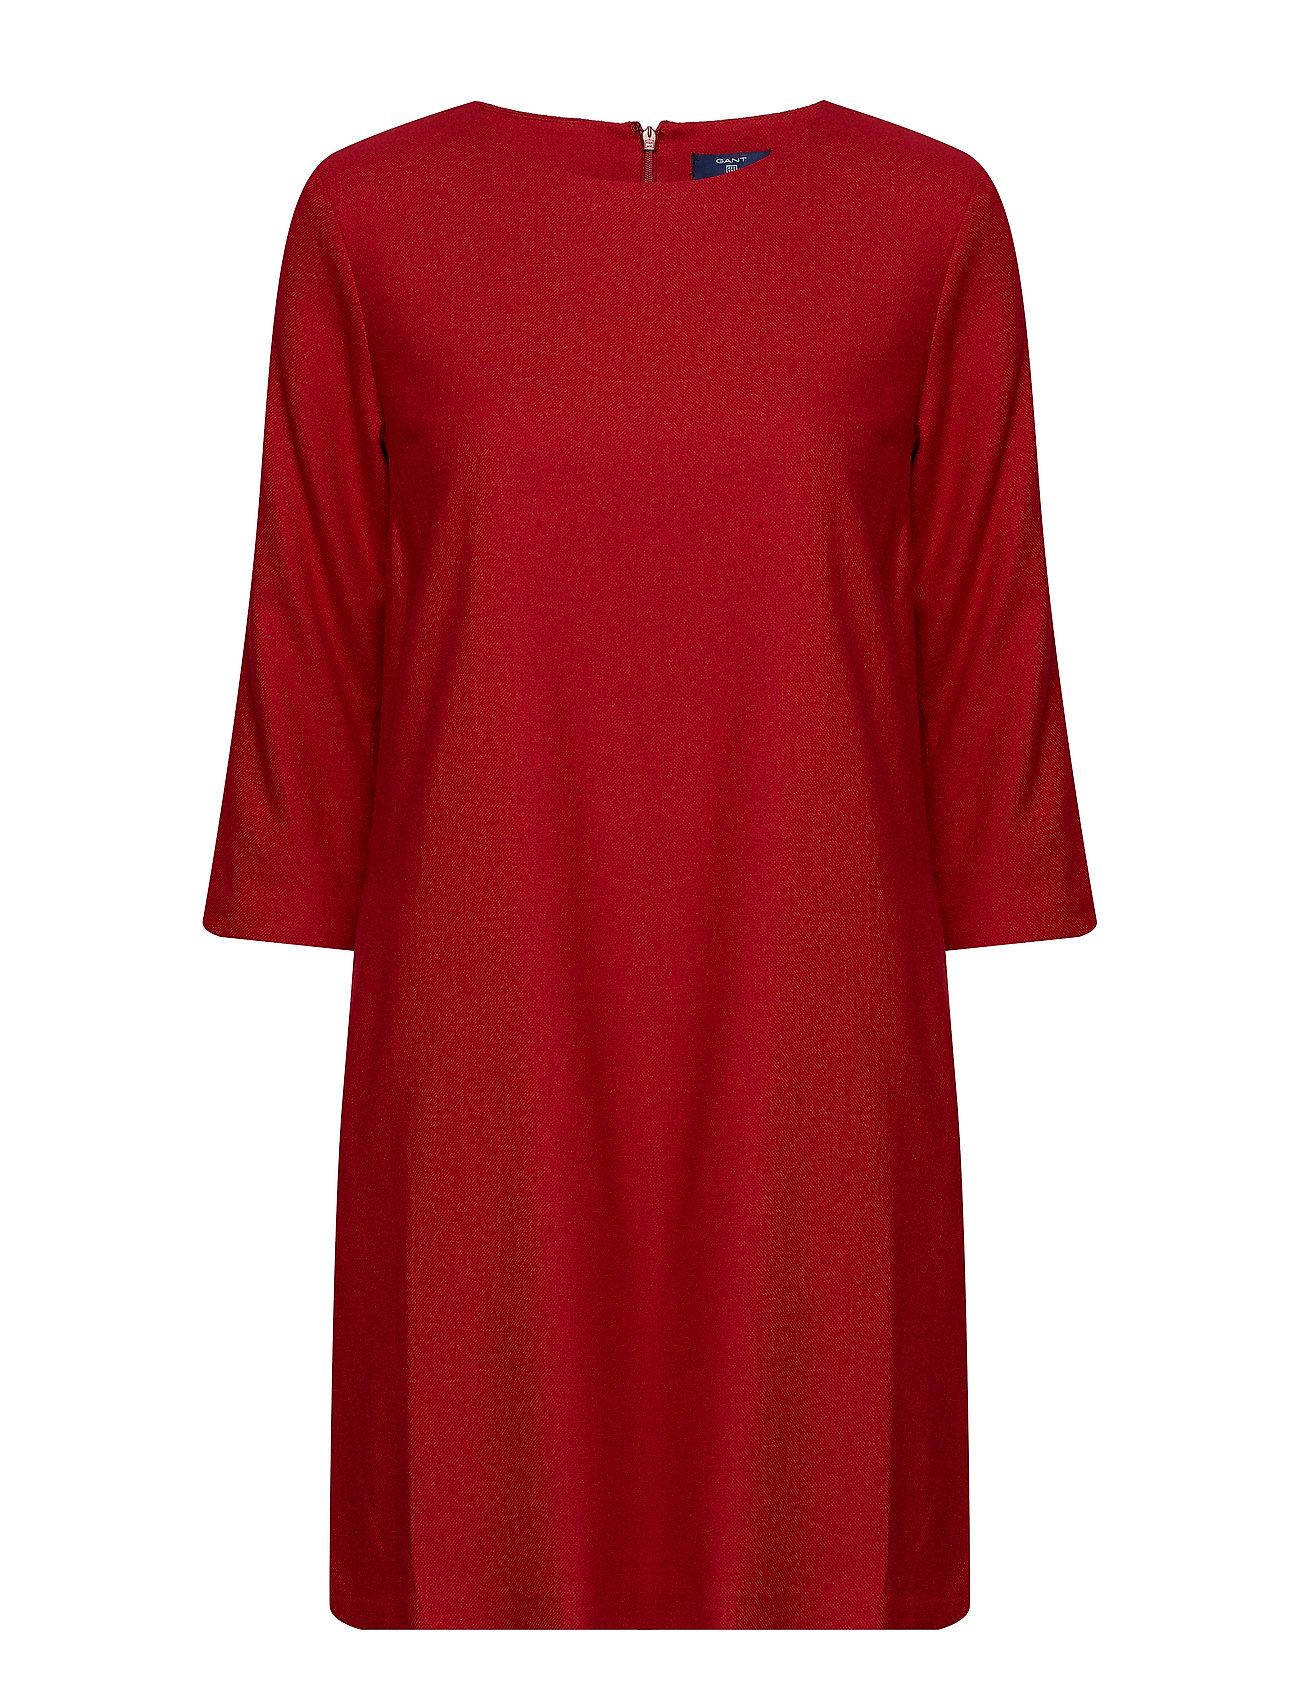 GANT O1.WASHABLE FLANNEL DRESS - RED